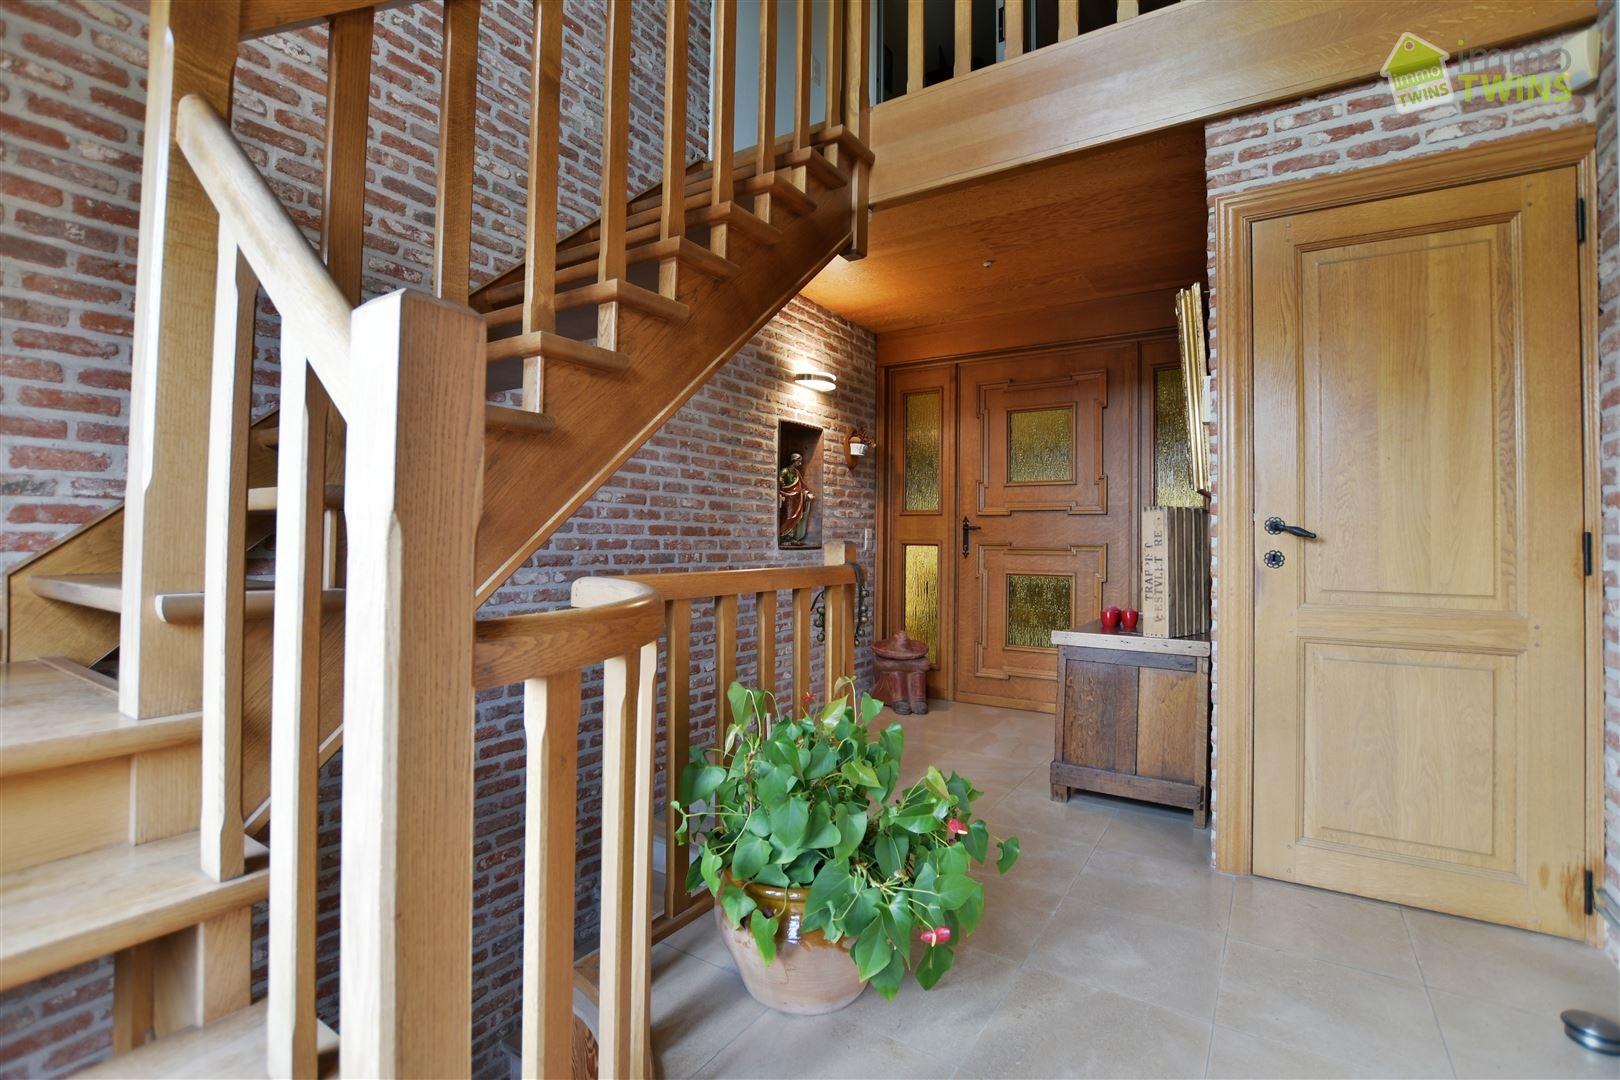 Foto 21 : Duplex/triplex te 9200 Dendermonde (België) - Prijs € 398.000